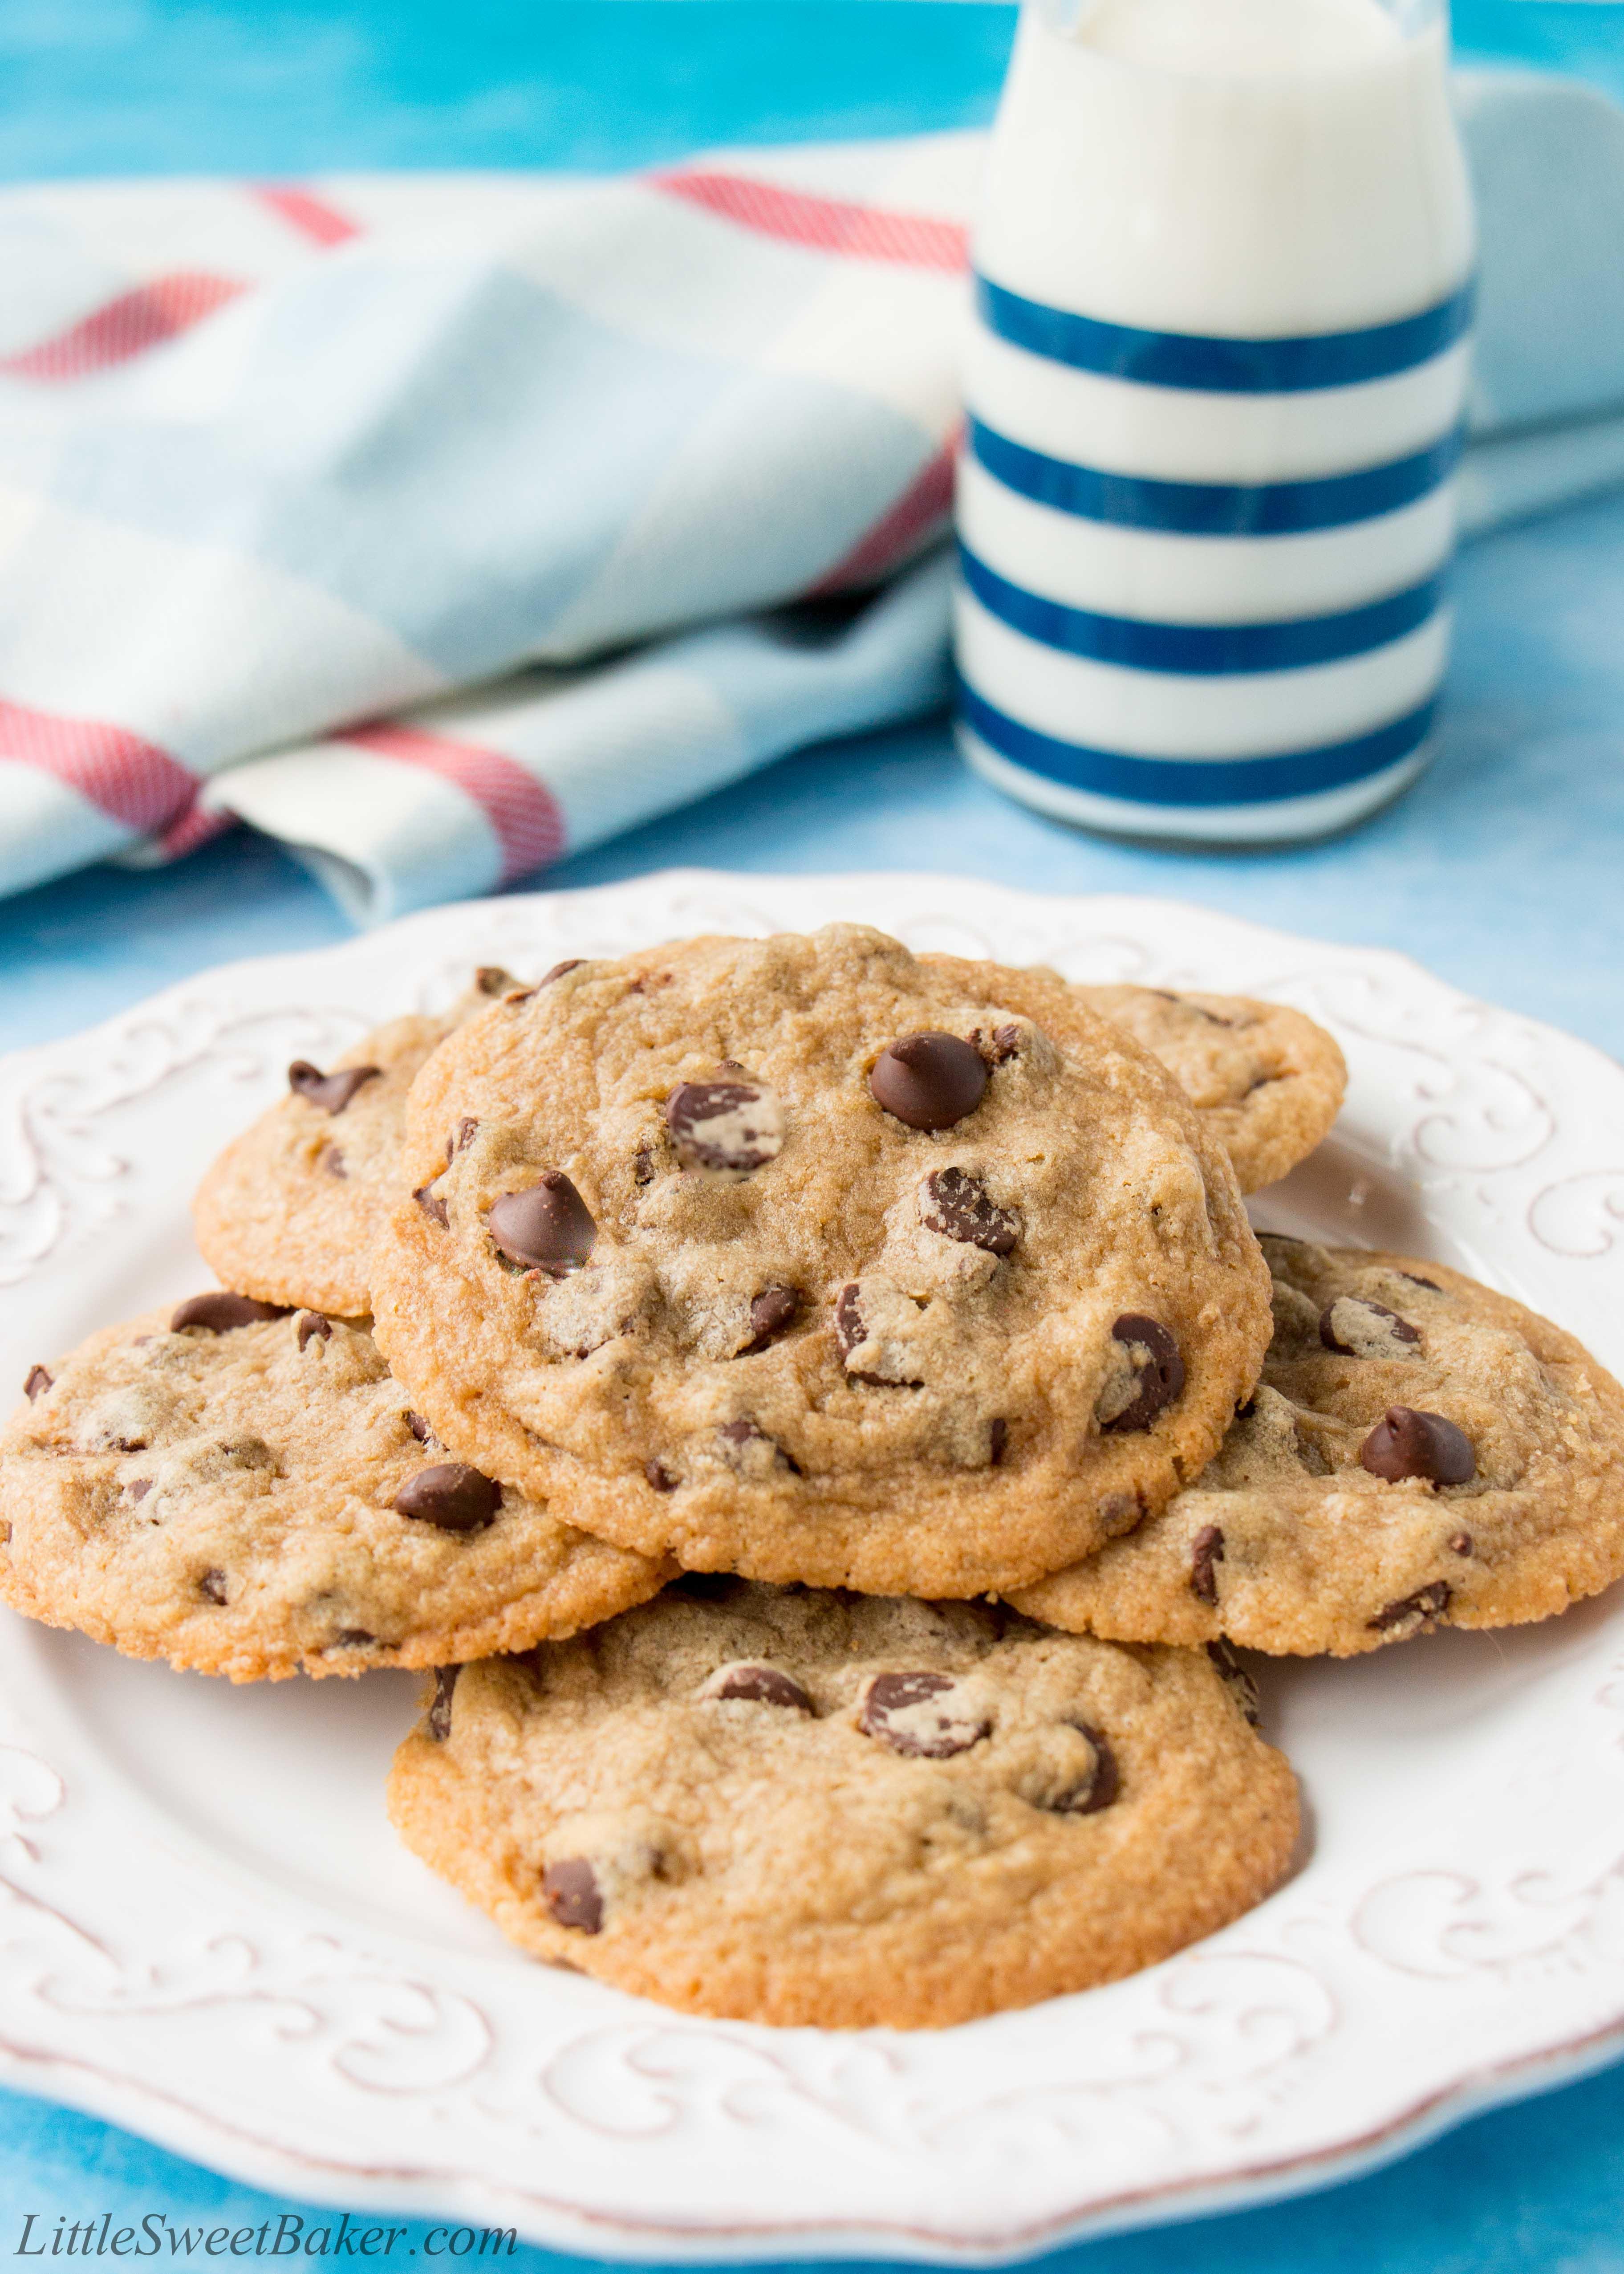 Easy Chocolate Chip Cookies Video Little Sweet Baker